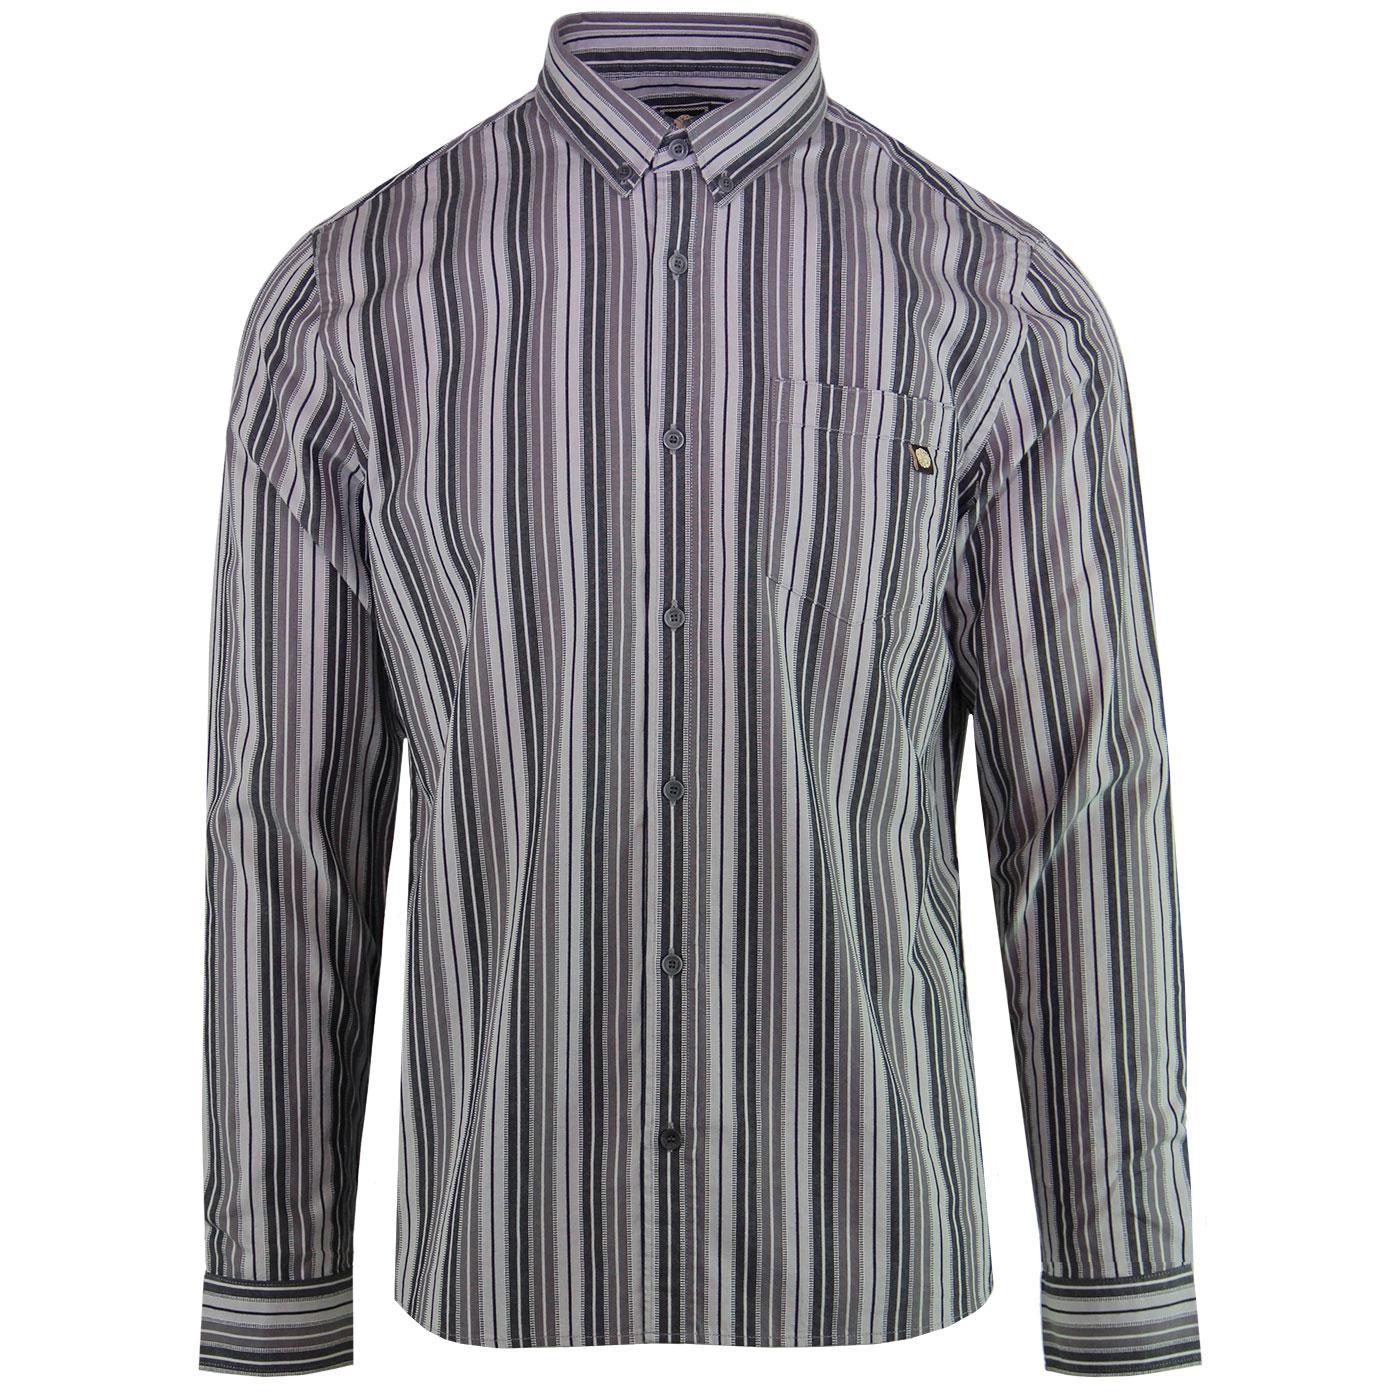 PRETTY GREEN 60s Mod Engineered Stripe Shirt GREY